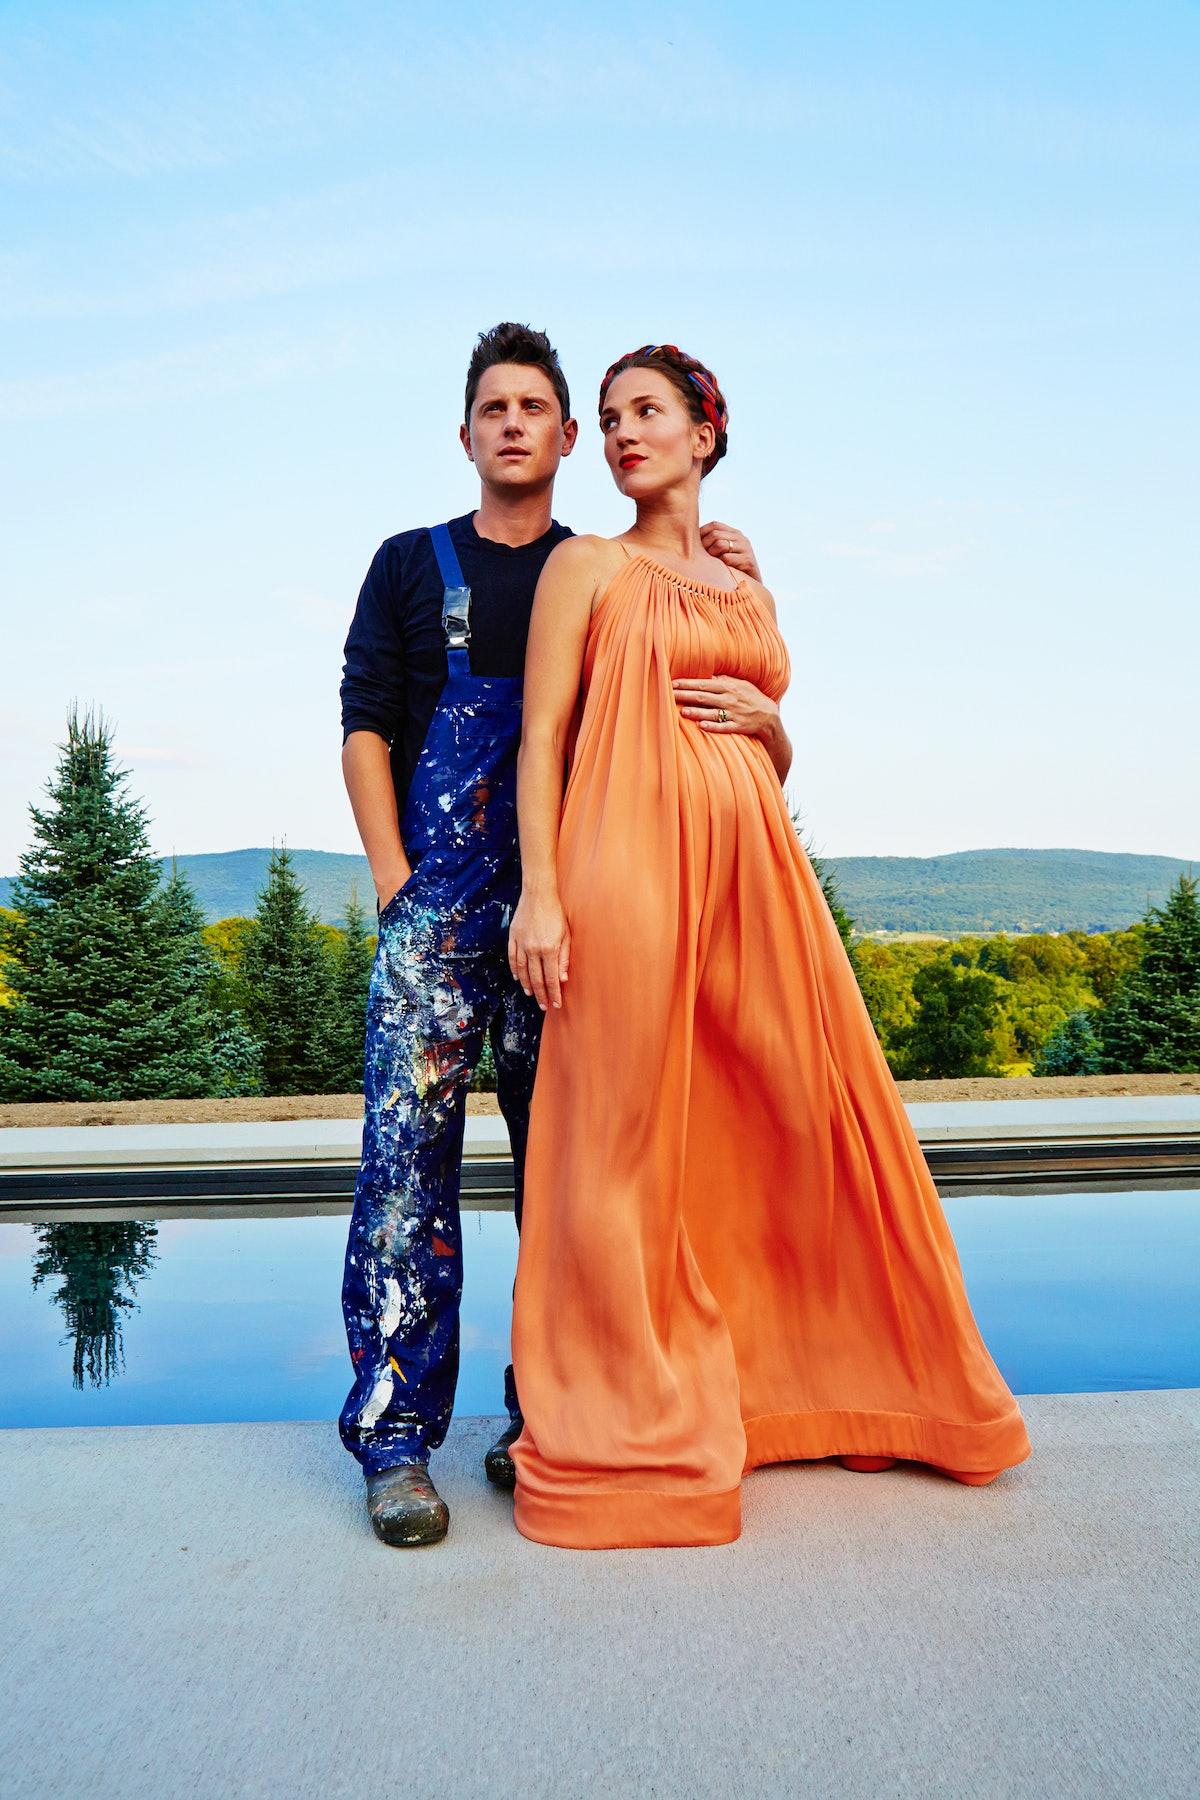 Garth Weiser and Francesca DiMattio